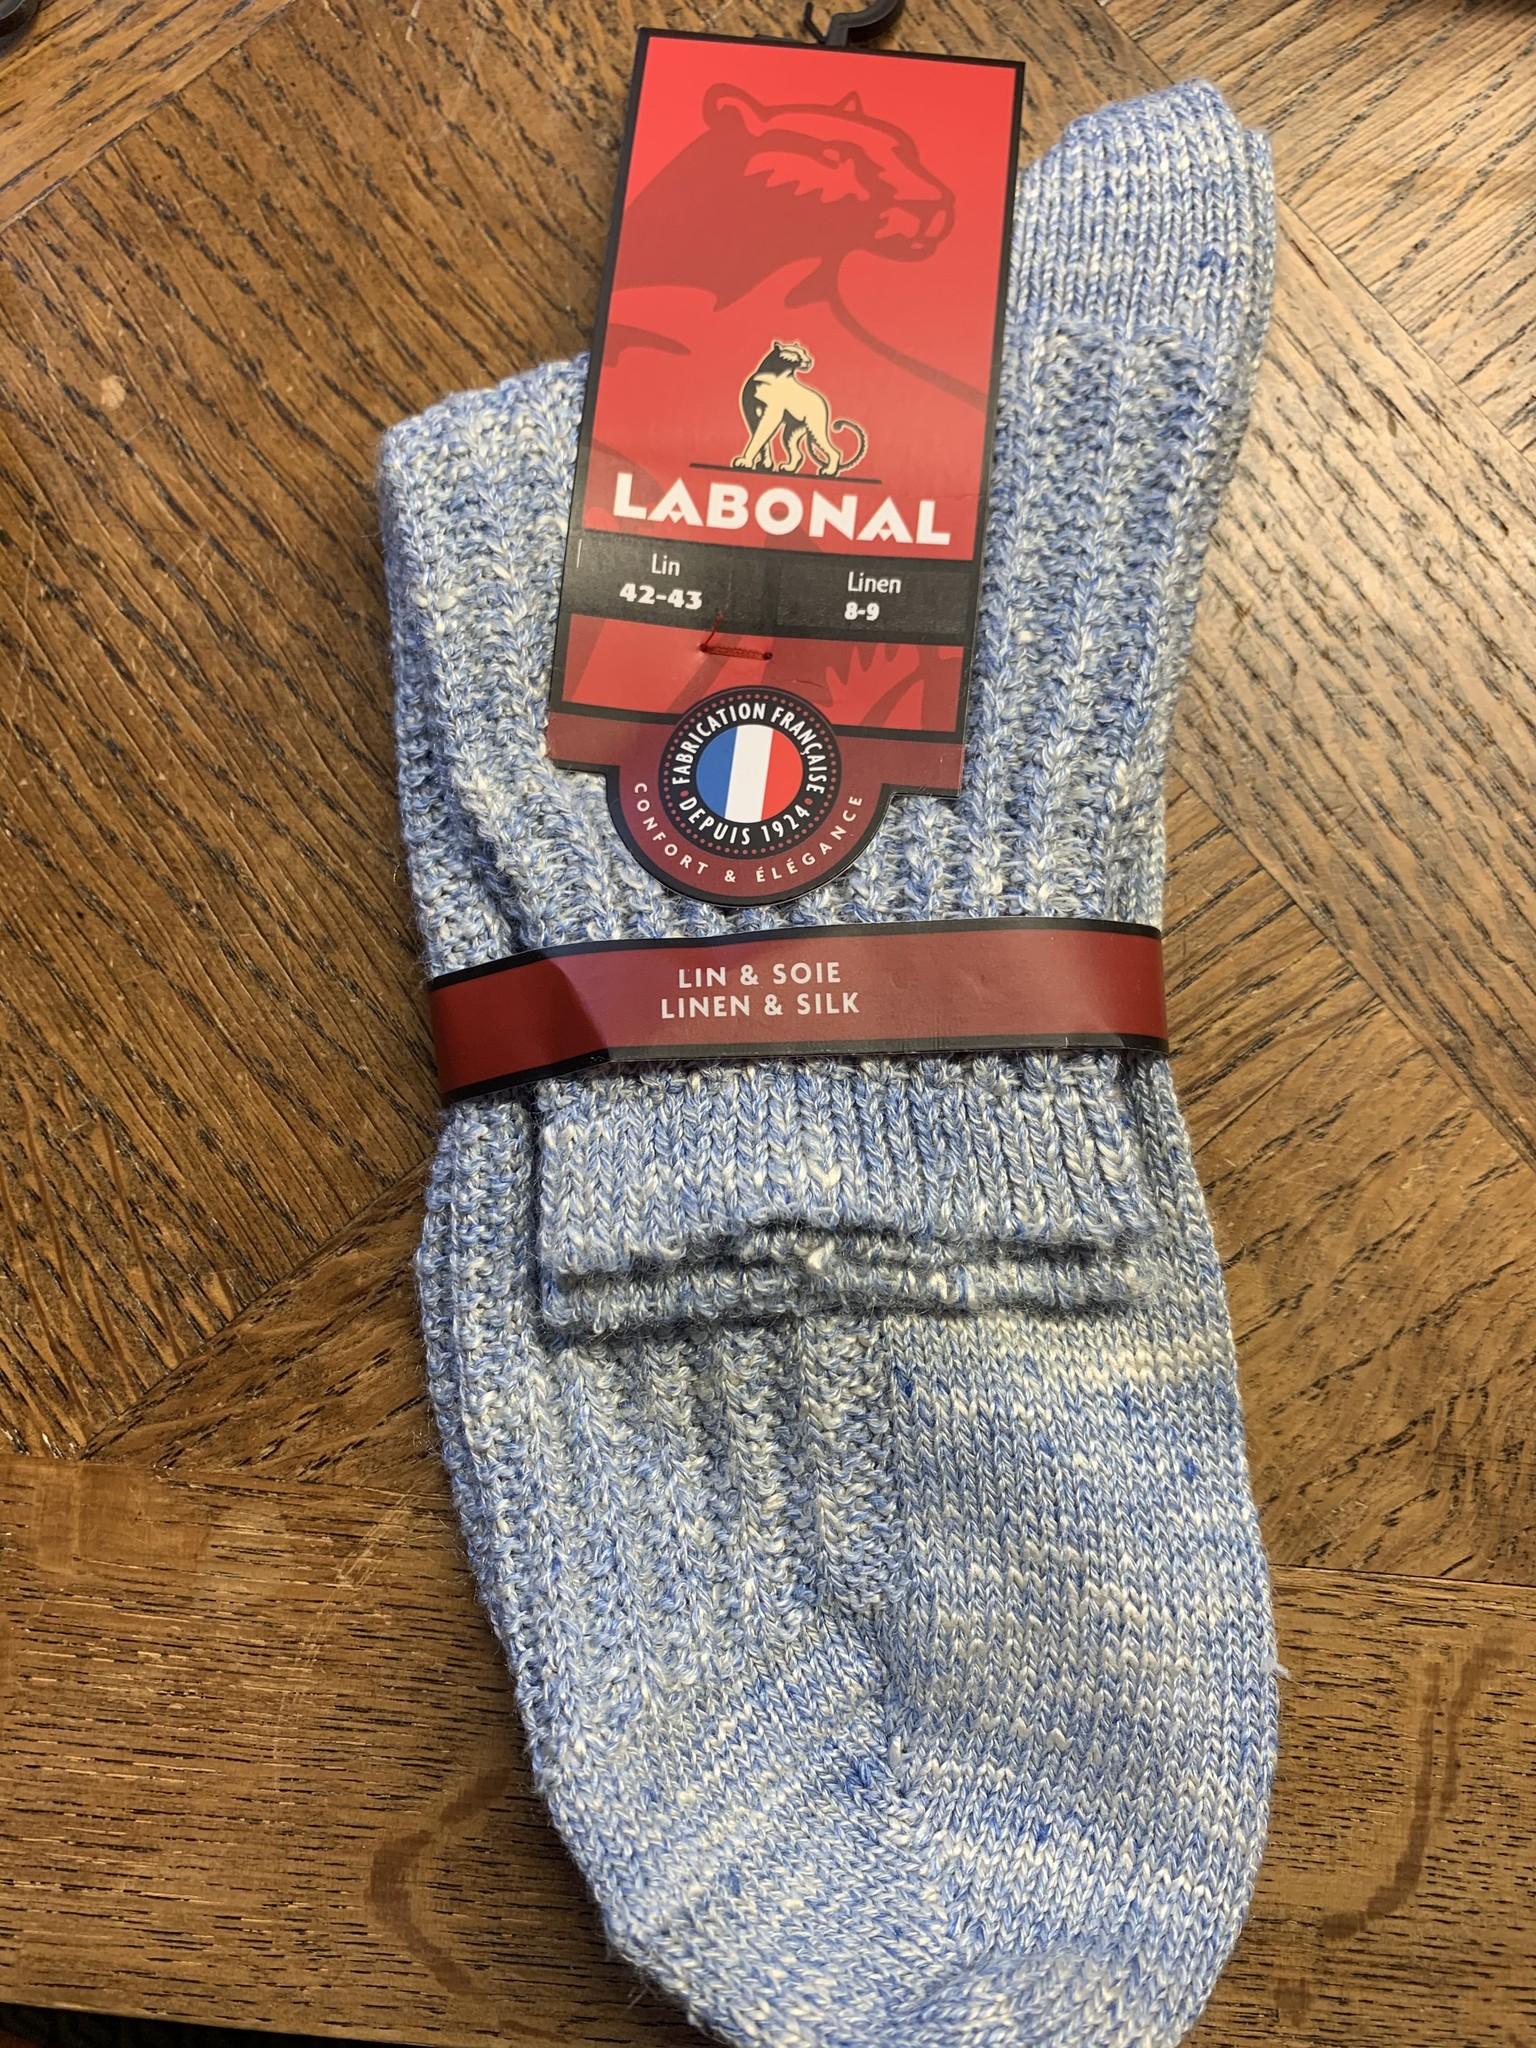 Labonal Men's sock in linen and blue silk